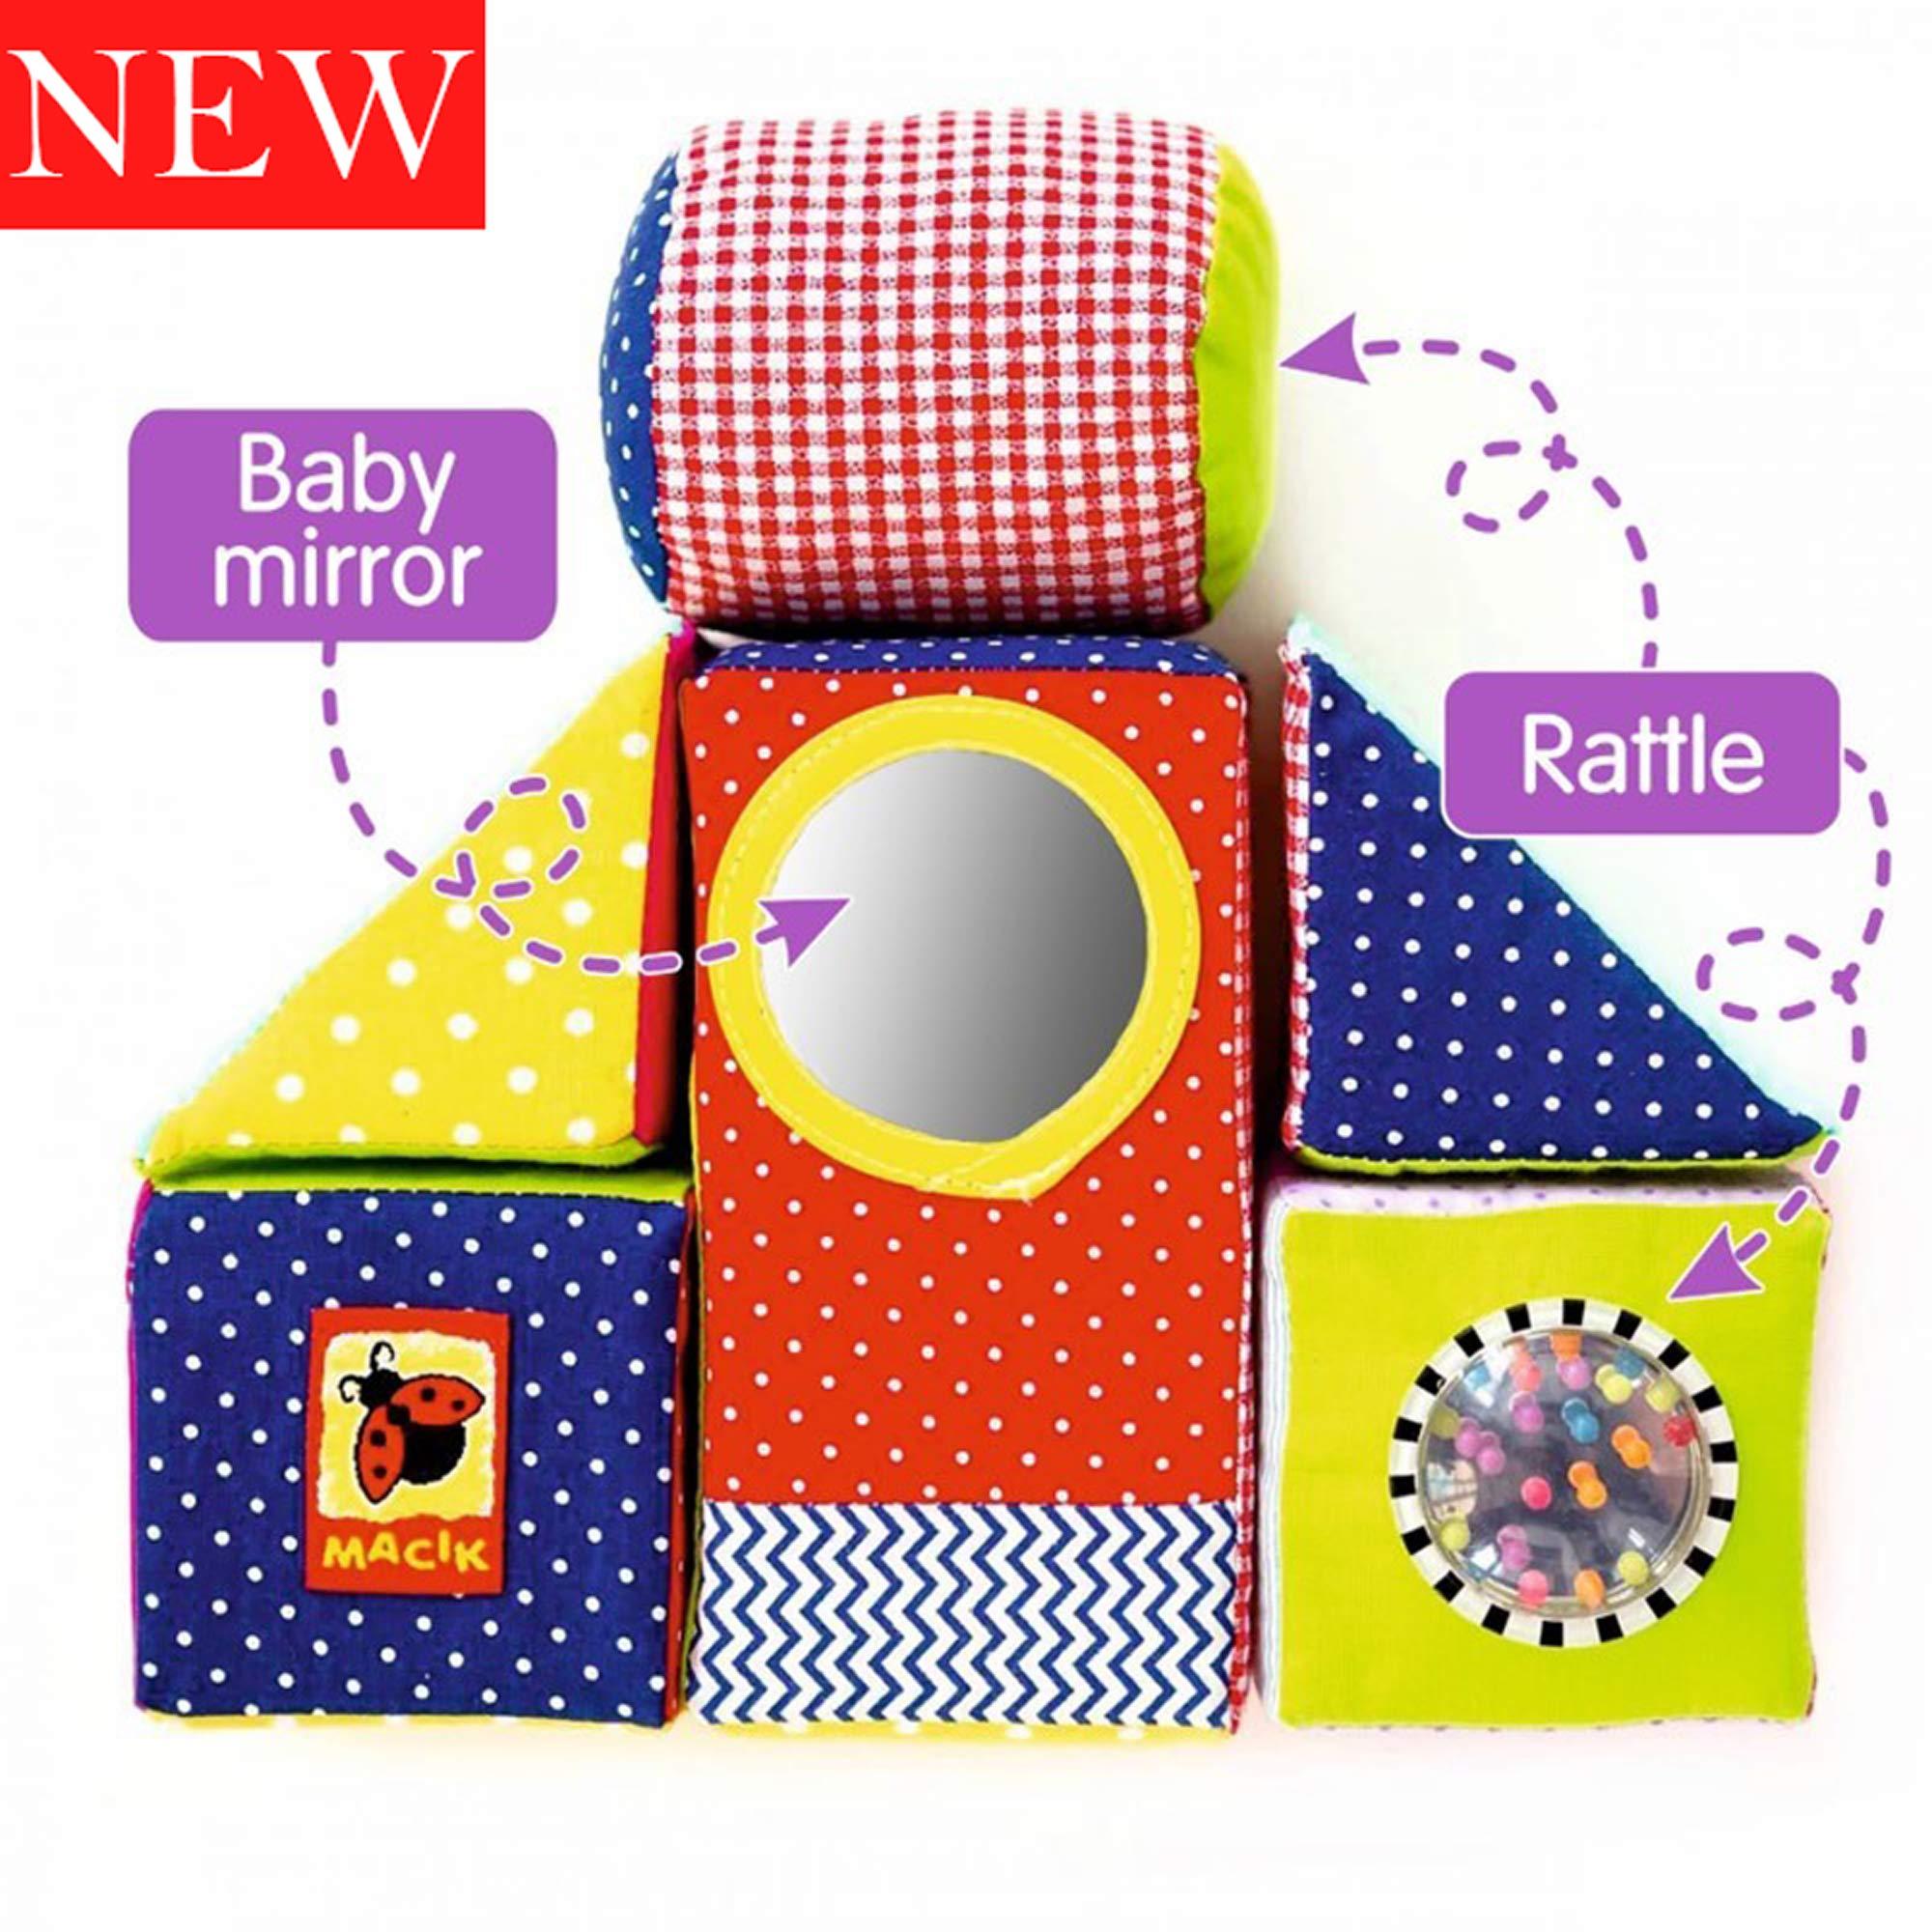 MACIK baby Soft Blocks for kids - baby Stacking toys baby Development toys - fine motor skills toys Soft Cubes - Soft infant toys 6m baby toys Rattle toy baby educational toys 12-18 months - Soft toys